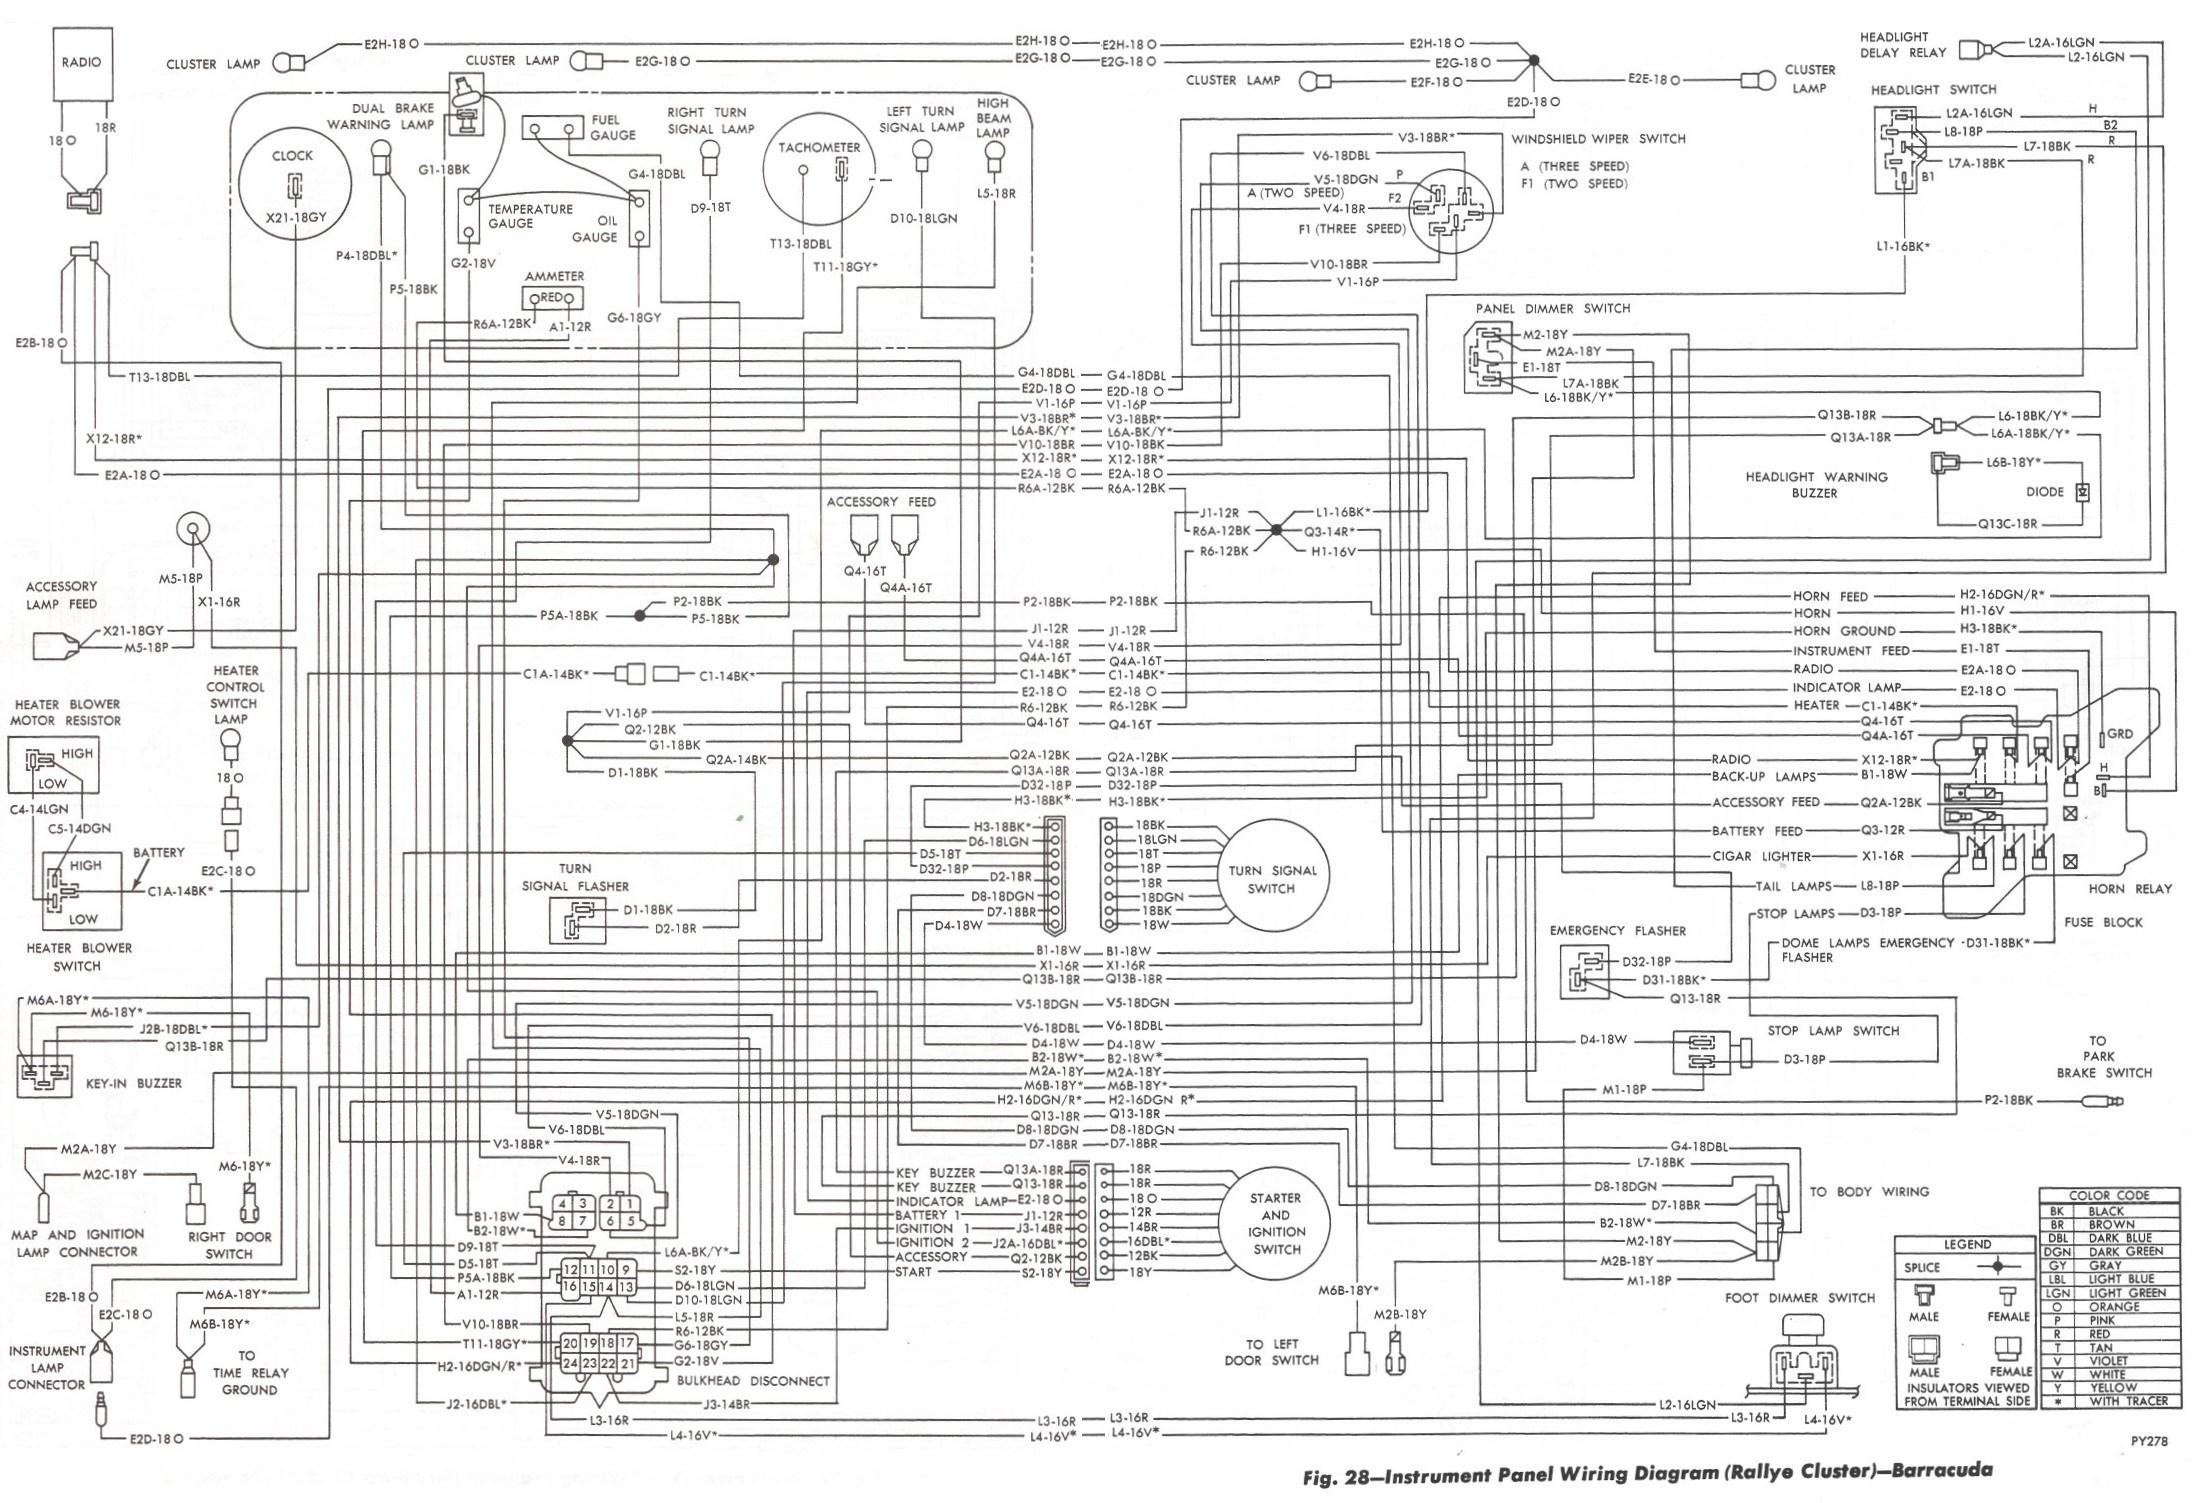 1970 Barracuda Wiring Diagram - Chevy 1500 Transmission 60e Wiring Diagram  for Wiring Diagram SchematicsWiring Diagram Schematics